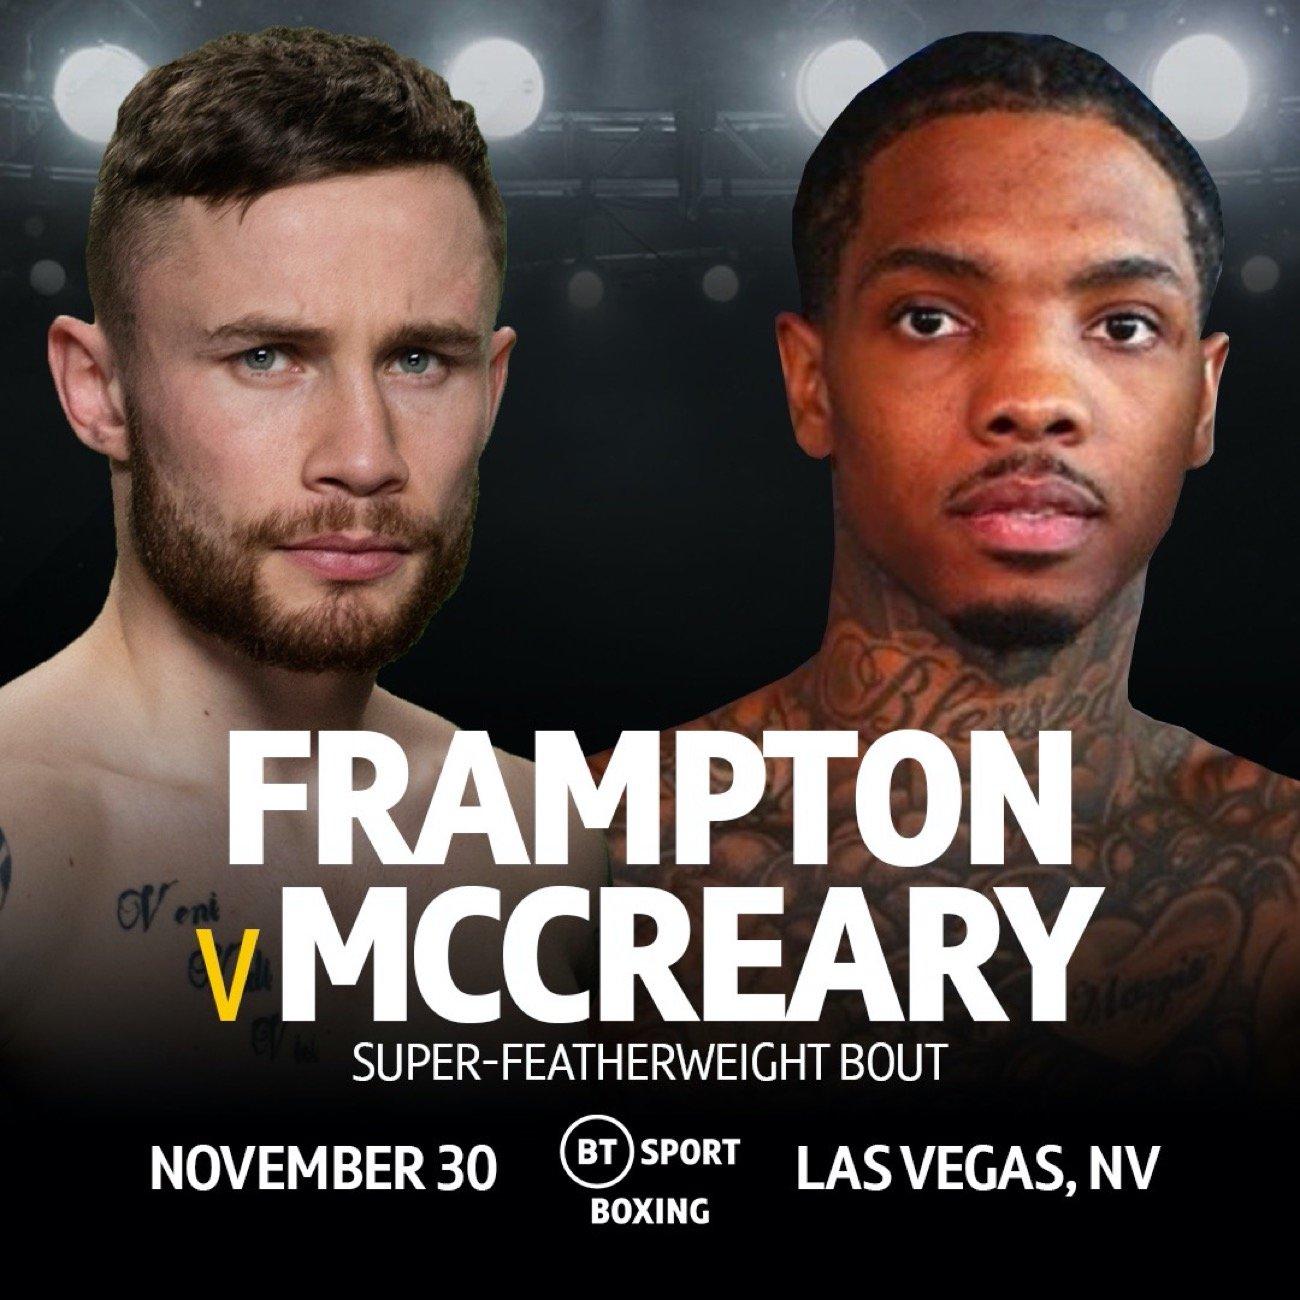 "Carl Frampton - FORMER TWO-WEIGHT WORLD CHAMPION Carl ""The Jackal"" Frampton makes his long awaited return on November 30th at The Cosmopolitan of Las Vegas, live on BT Sport."